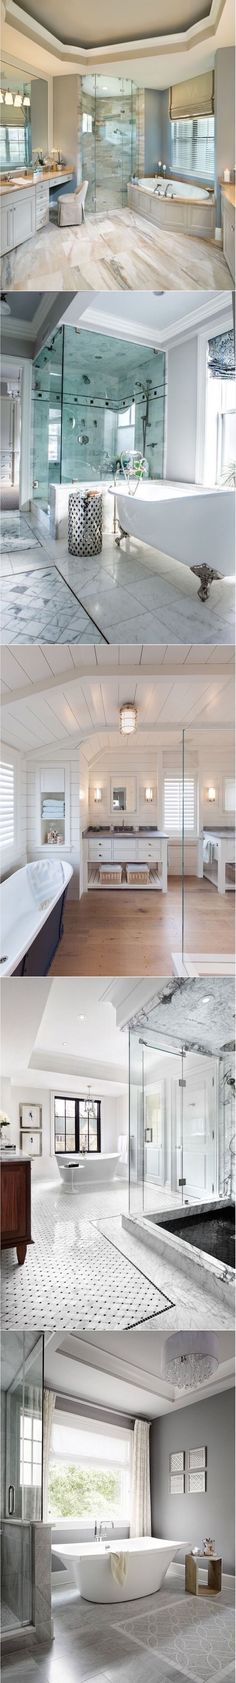 #master #bathroom #bath #bathroomideas #bathroomdesign #styleestate #interiordesignideas #design